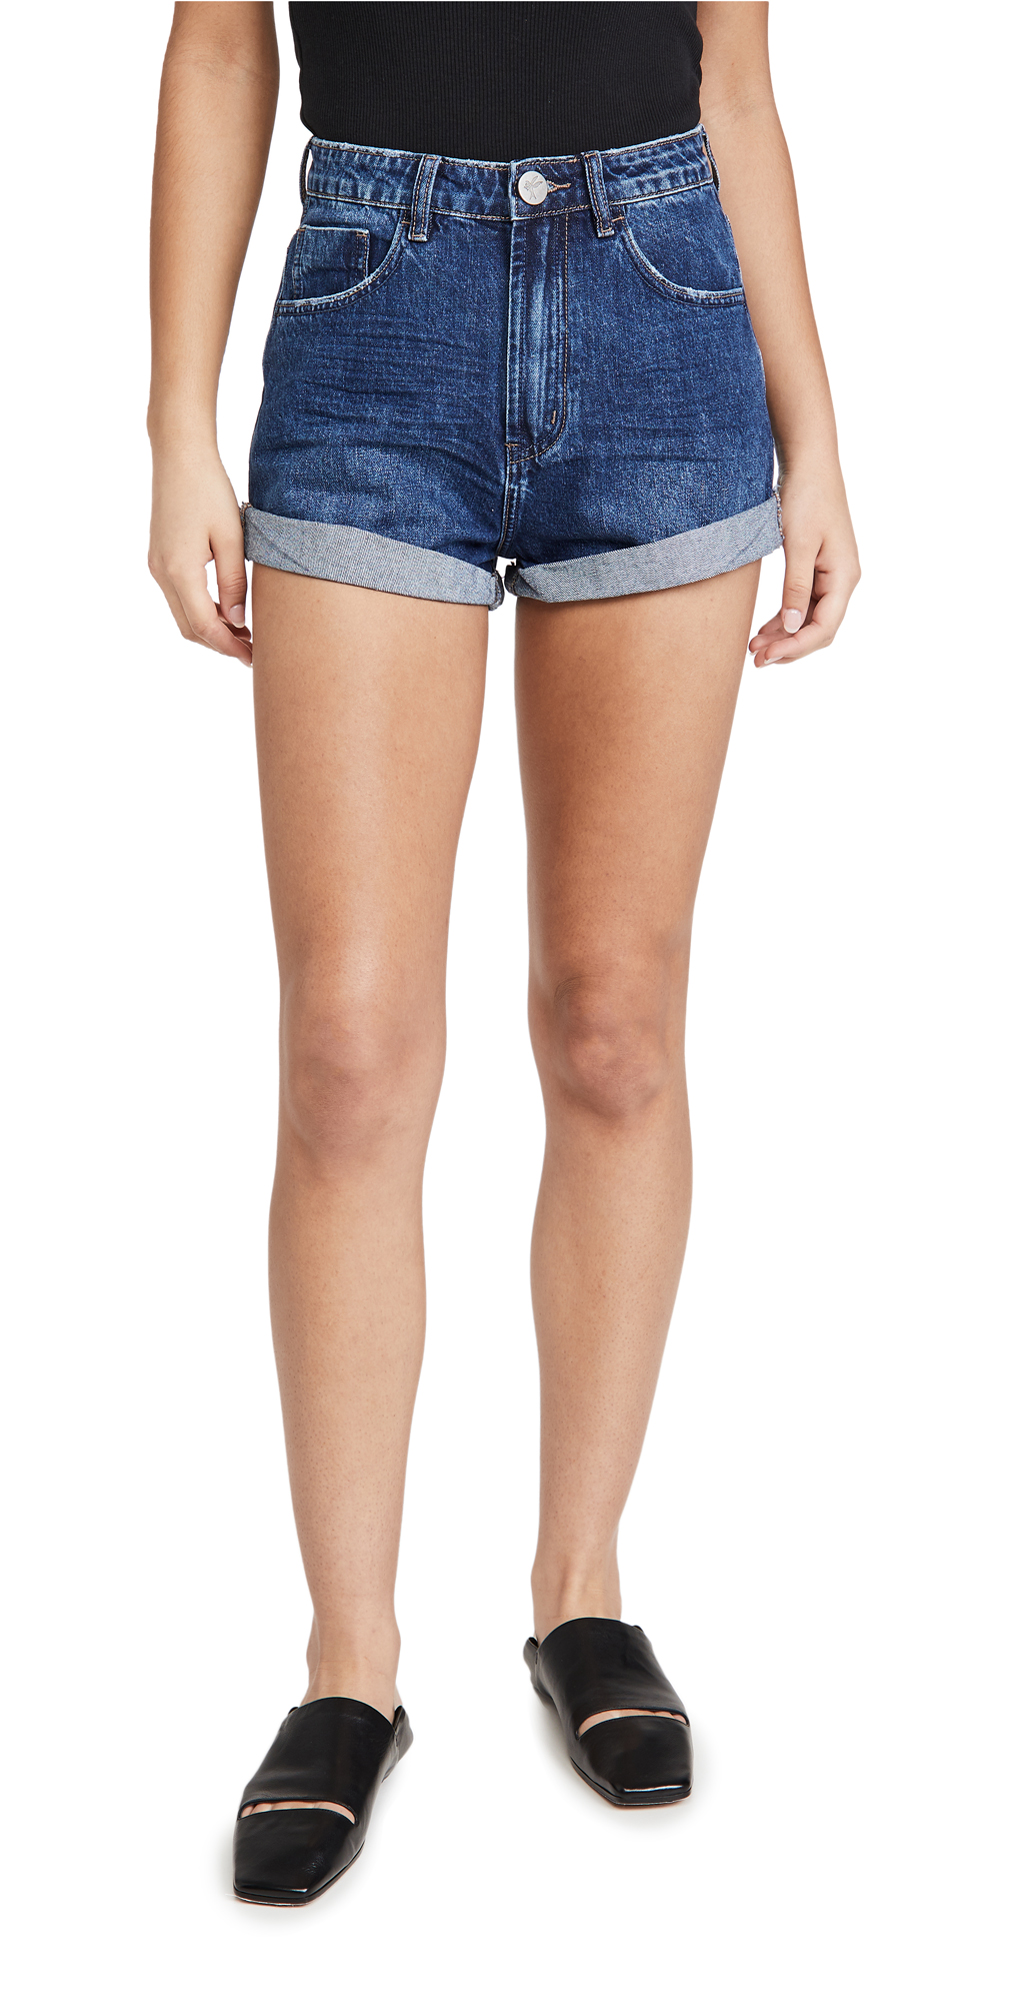 One Teaspoon Dakota Bandits High Waist Denim Shorts